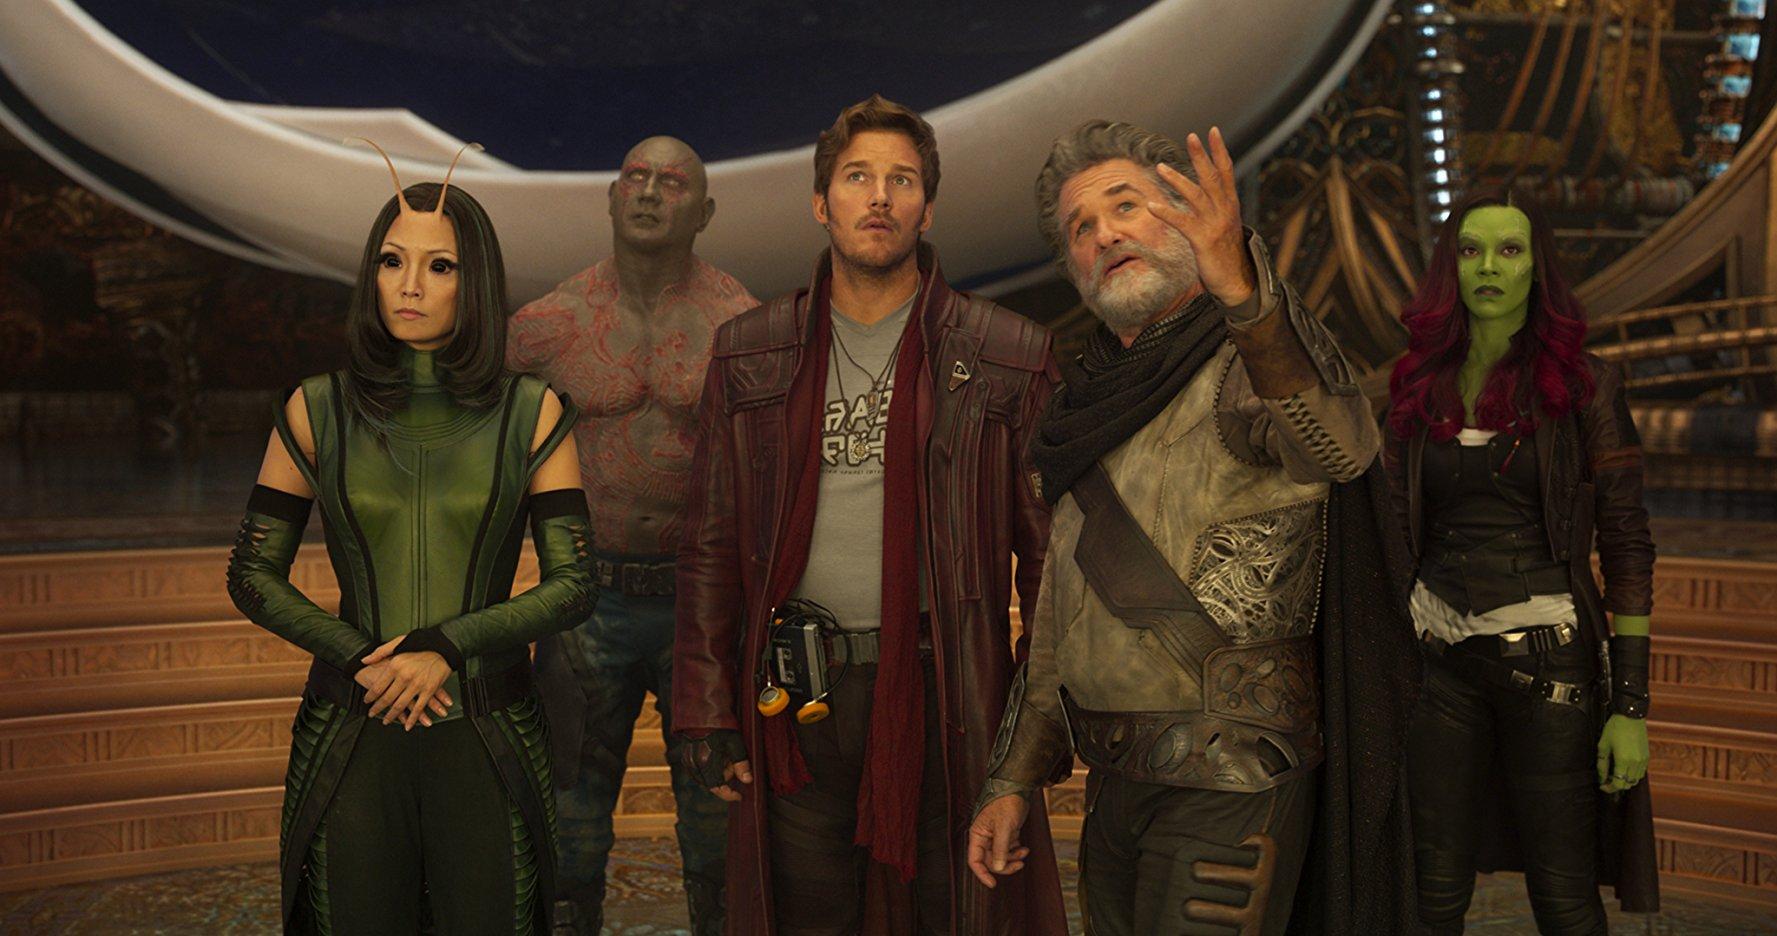 Kurt Russell, Chris Pratt, Zoe Saldana, Dave Bautista e Pom Klementieff